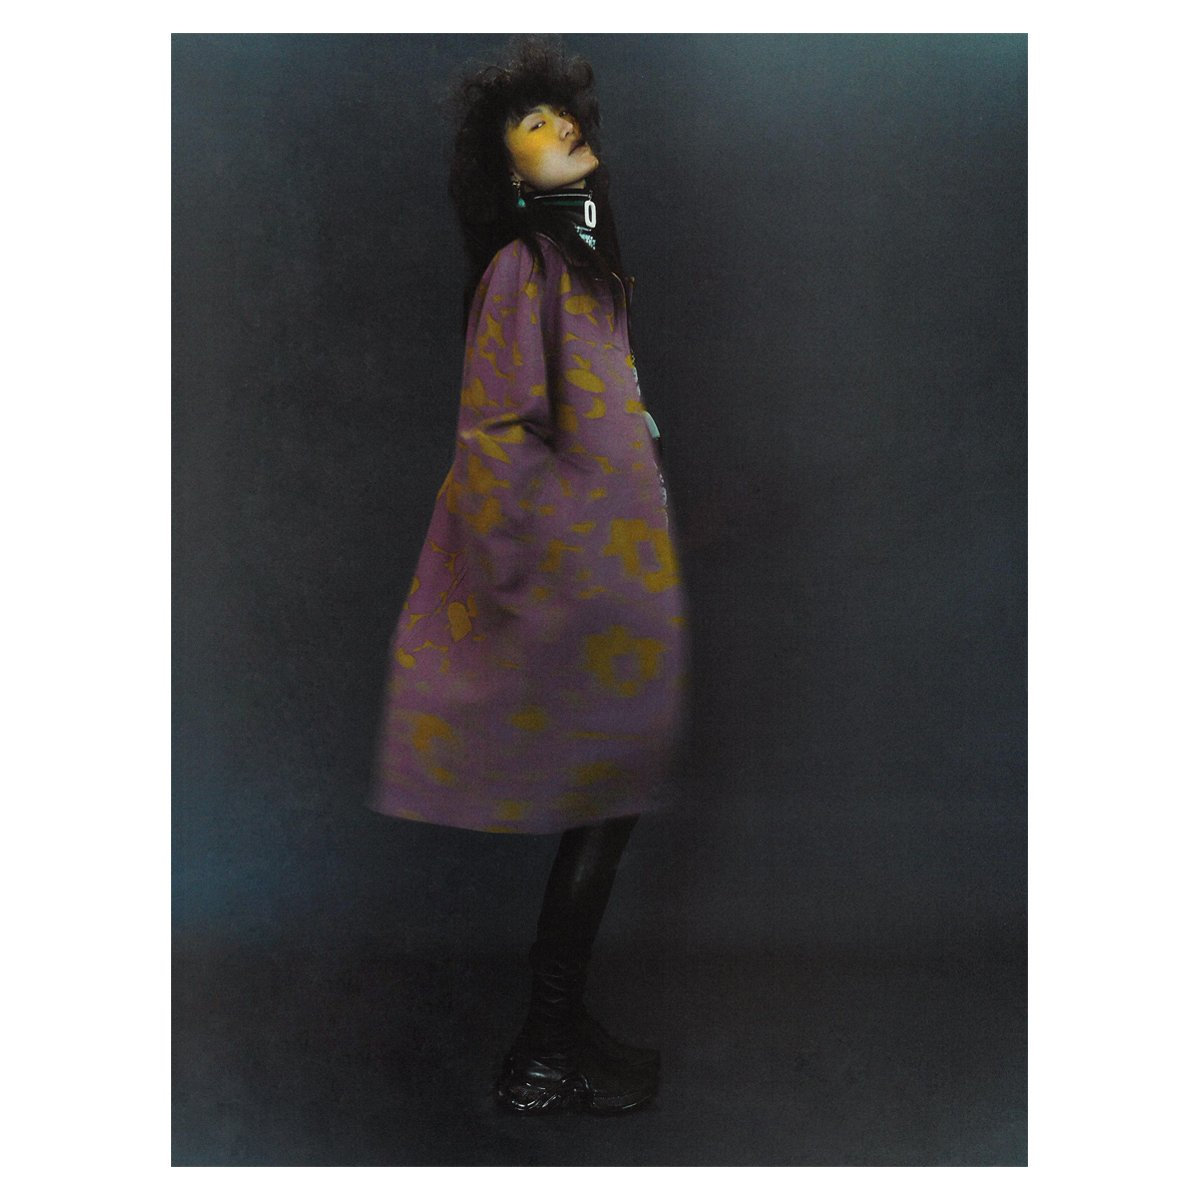 #MarniResort2019 floral coat featured on #harpersbazaarkorea  #marnieditorials https://t.co/SgJu0g5T3F